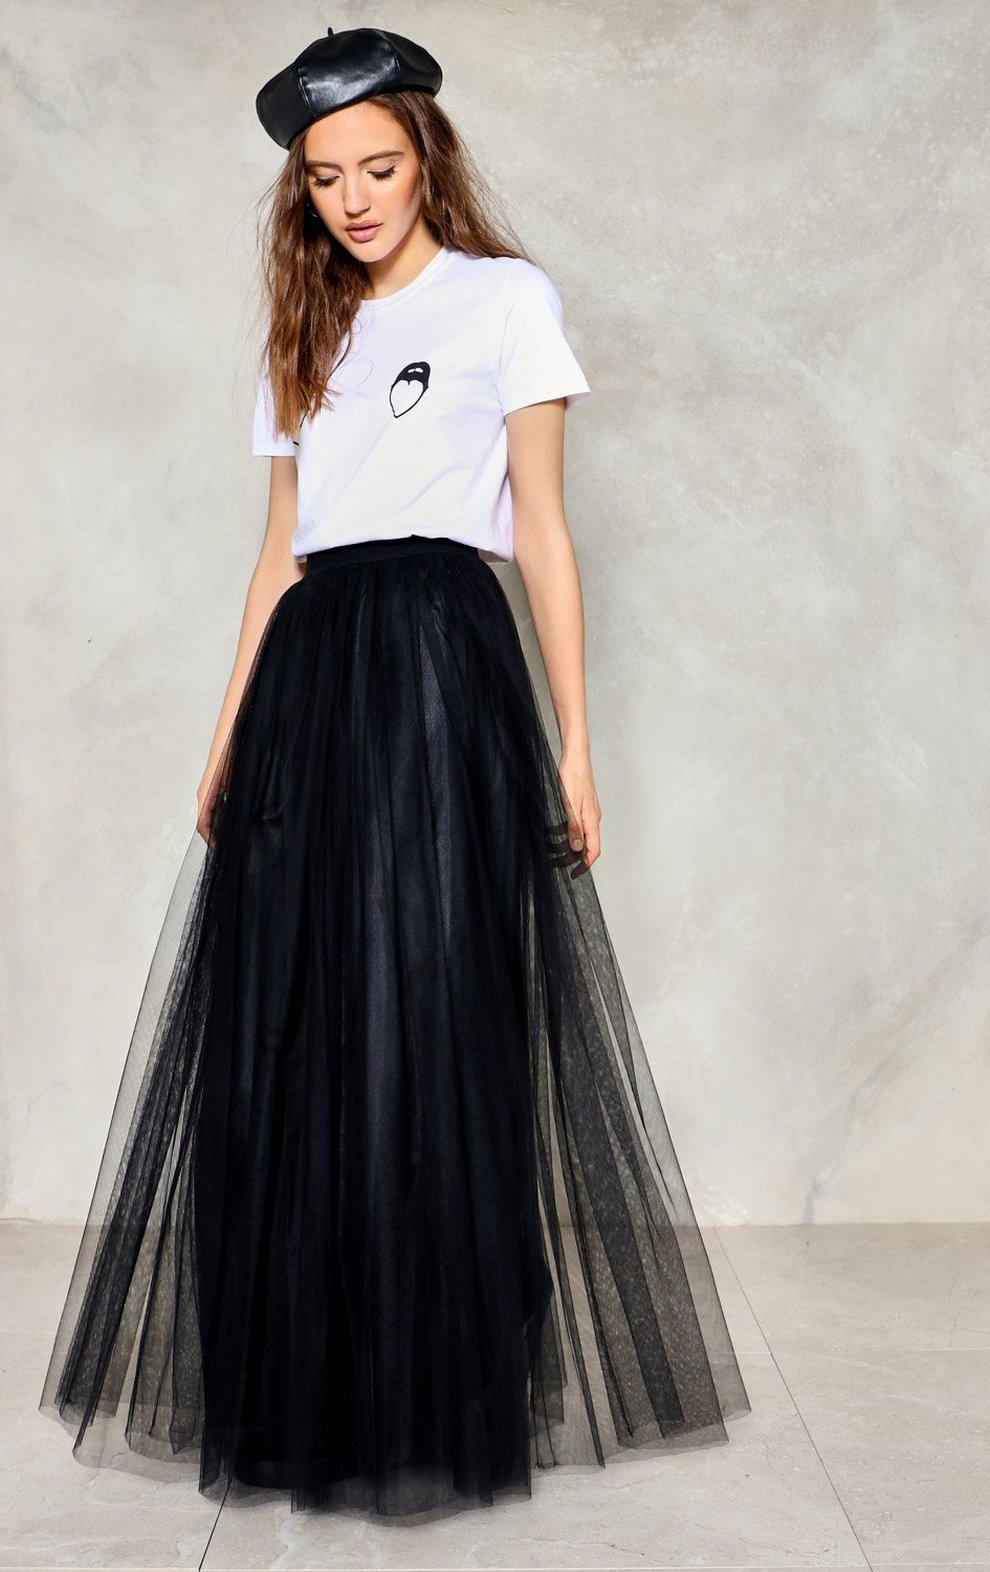 e6c0a5db53 Shirts That Go With Black Maxi Skirt - DREAMWORKS